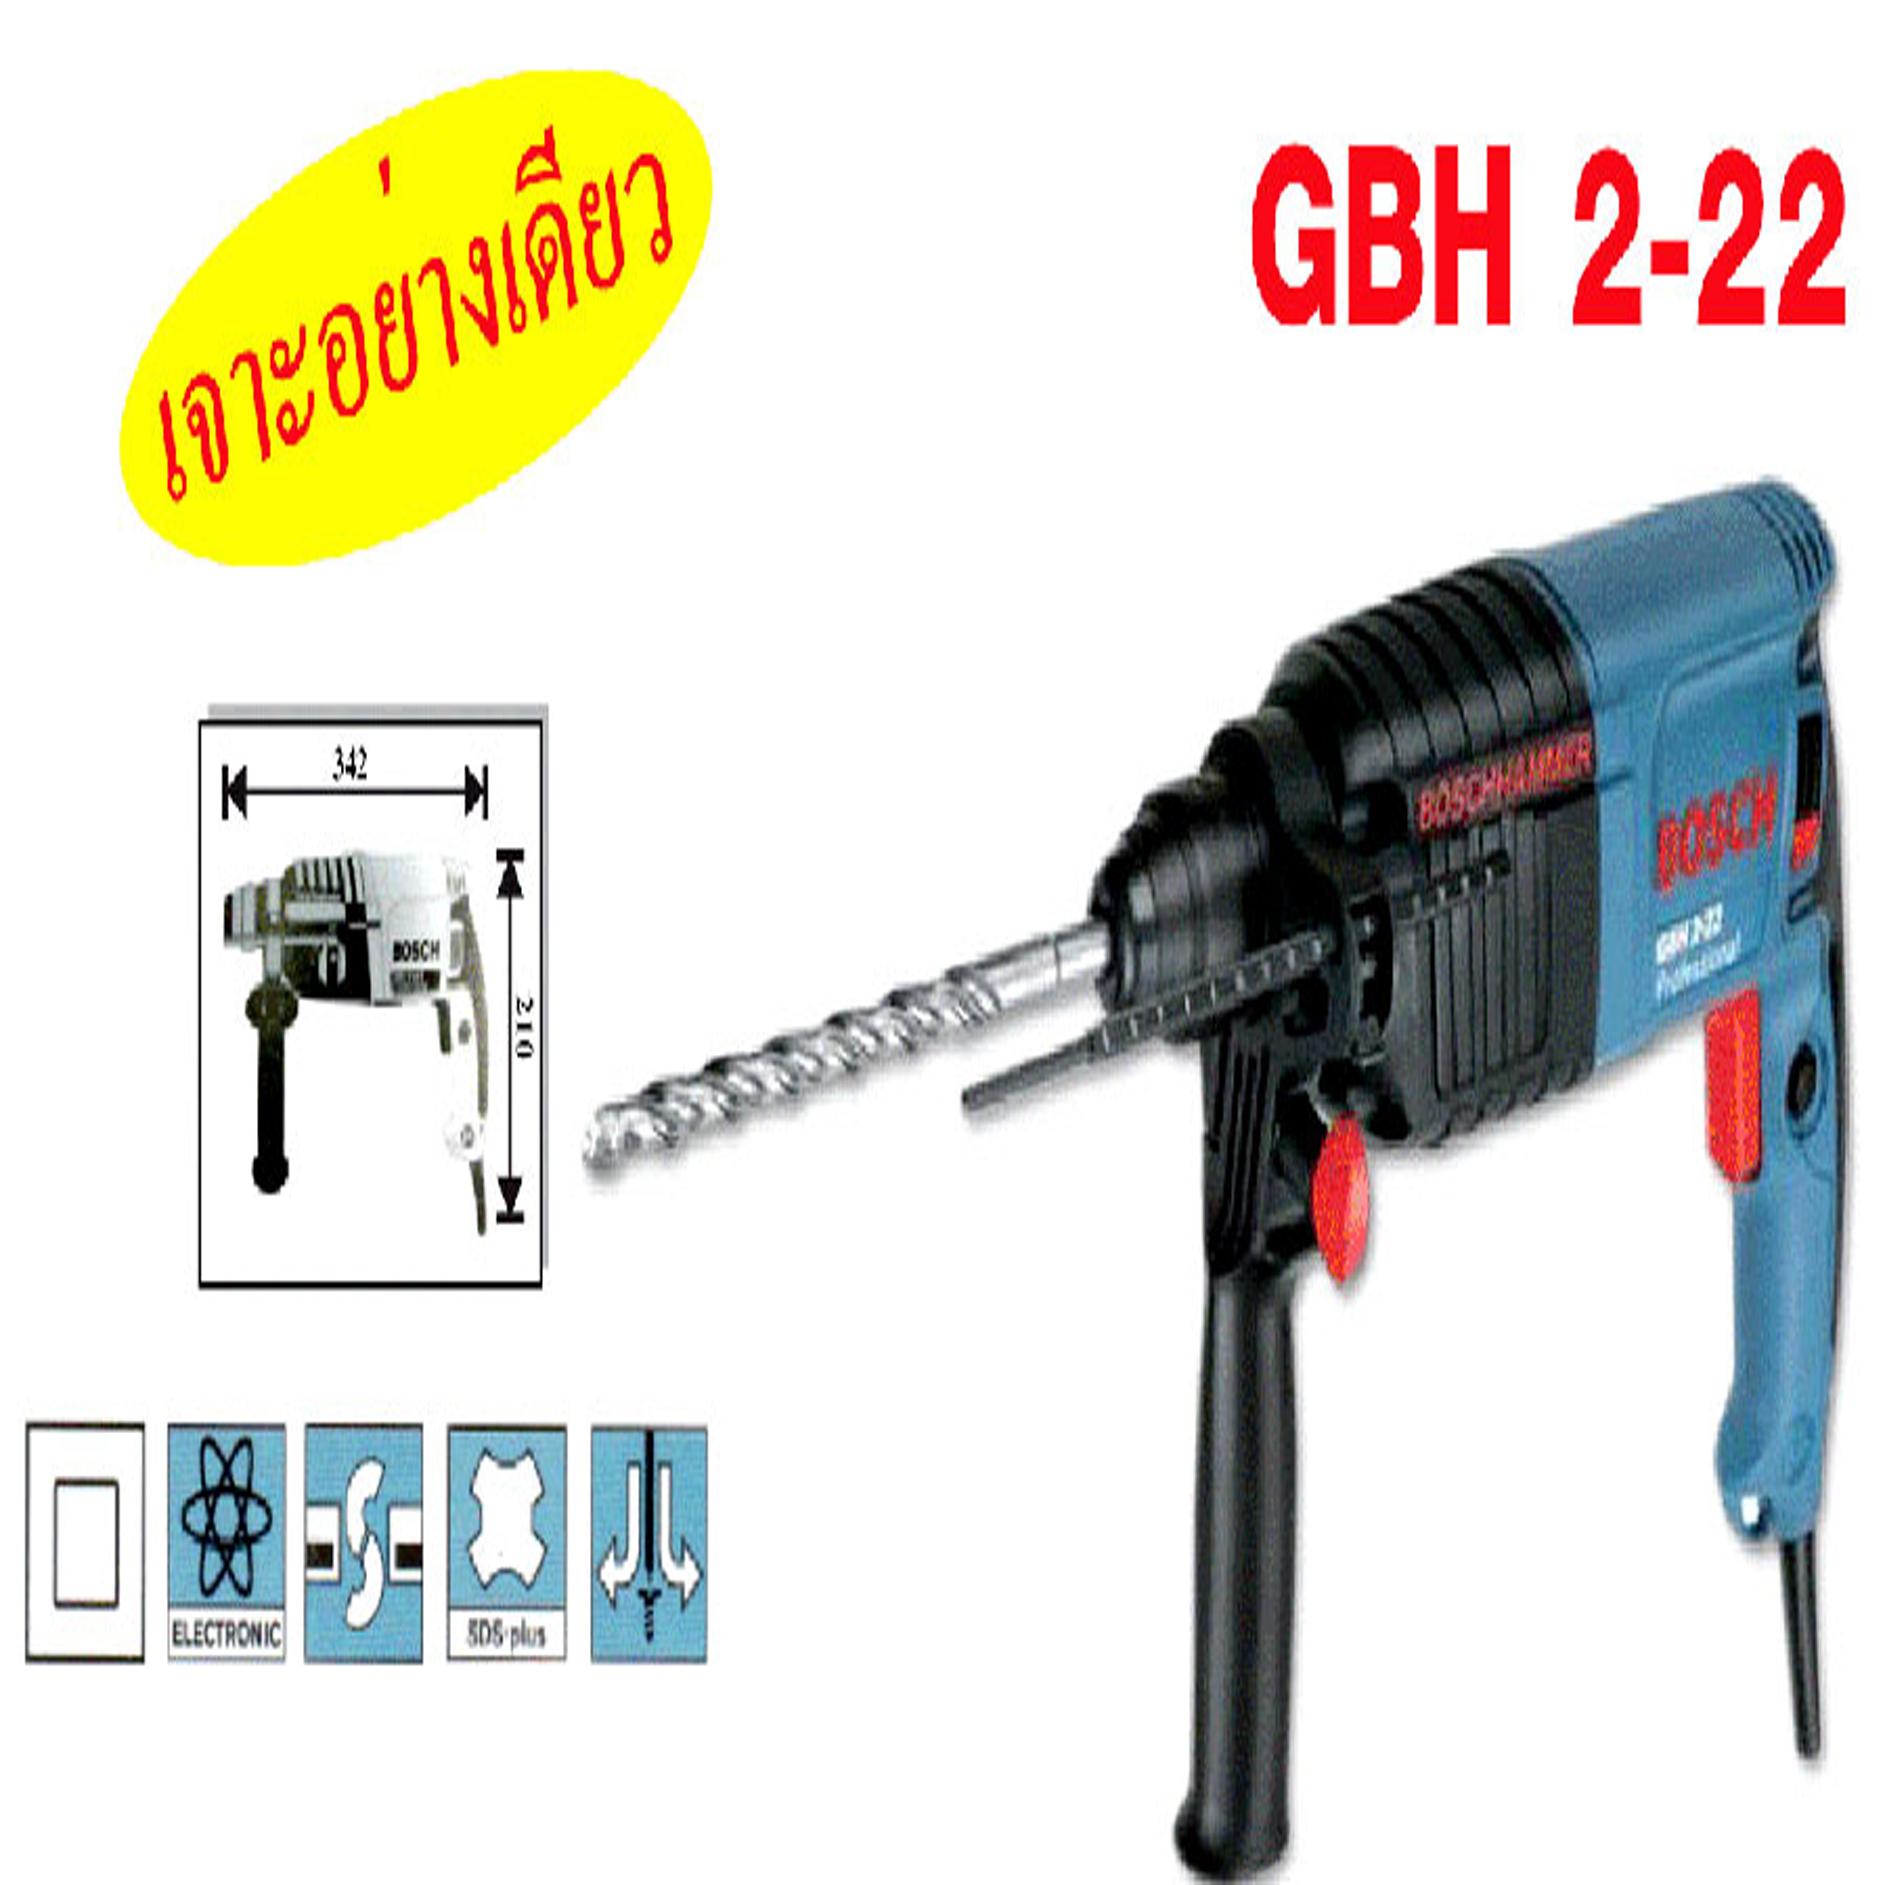 Harga Jual Bosch GBH 2 22 Mesin Bor Tembok Rotary Hammer